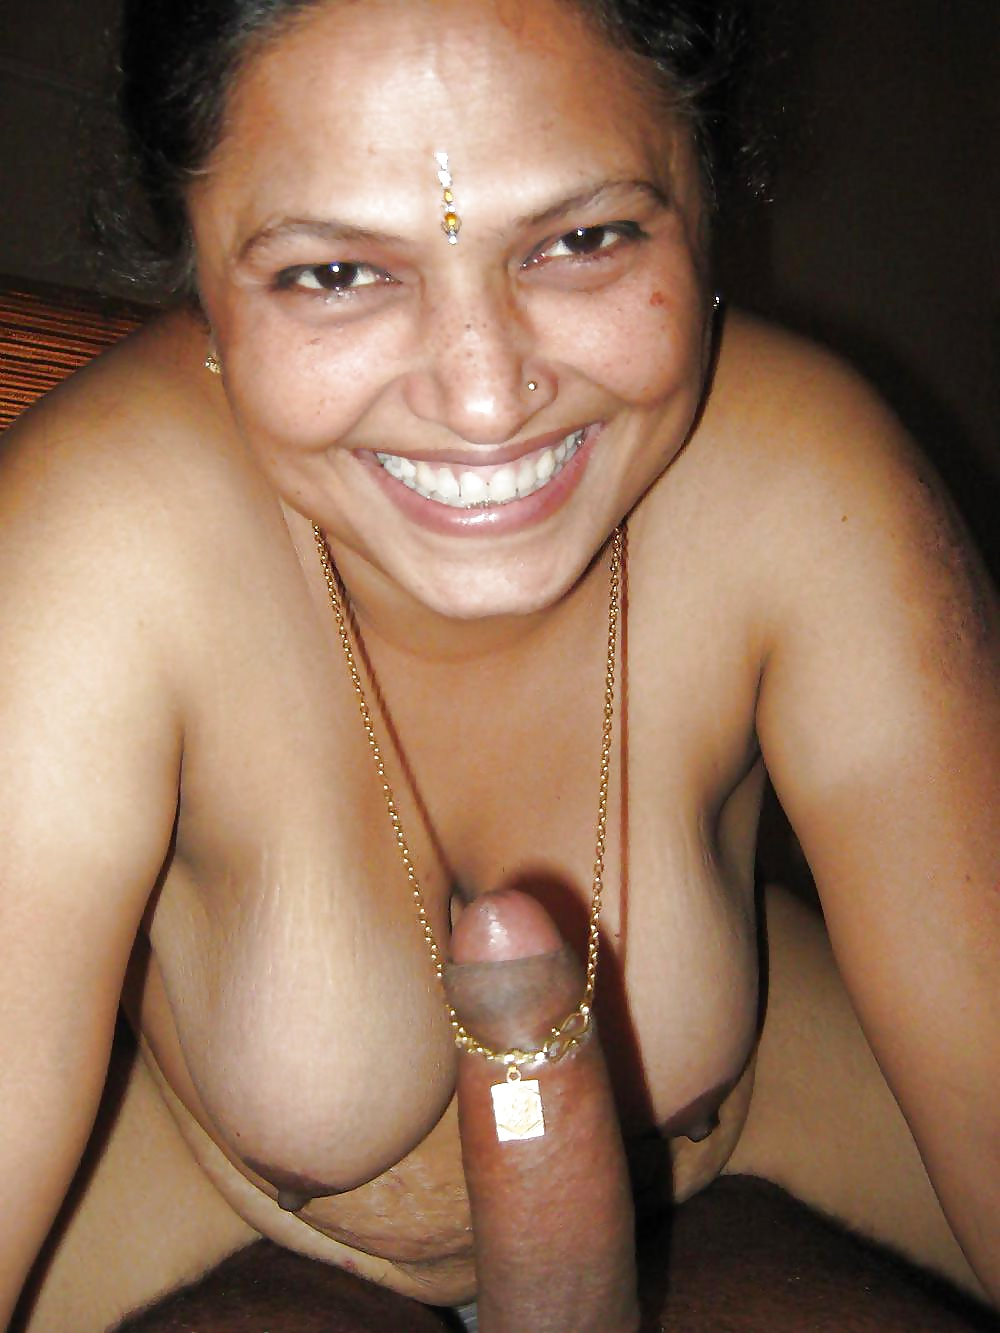 Kerala Nurse Nude Pics And Pics